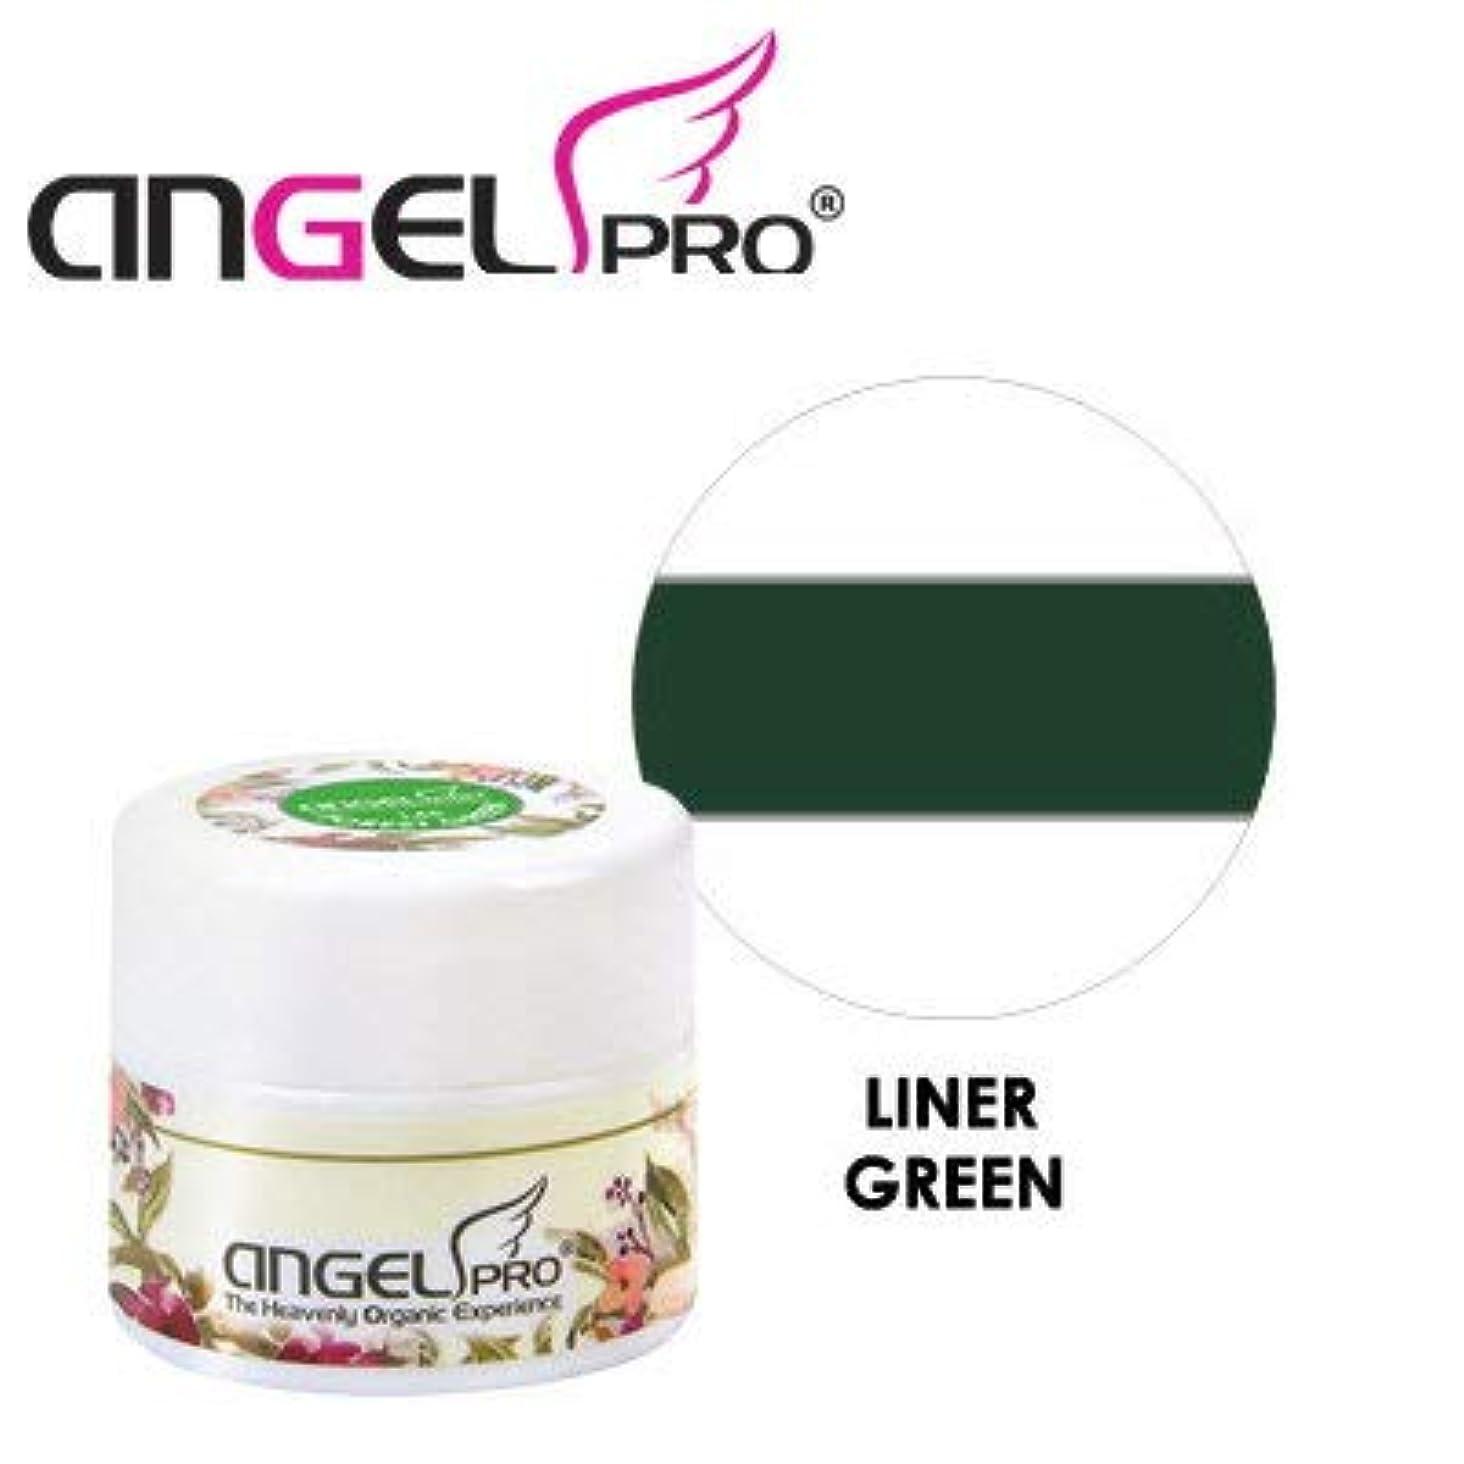 ANGEL PRO ポットジェリー LINER GREEN 4g